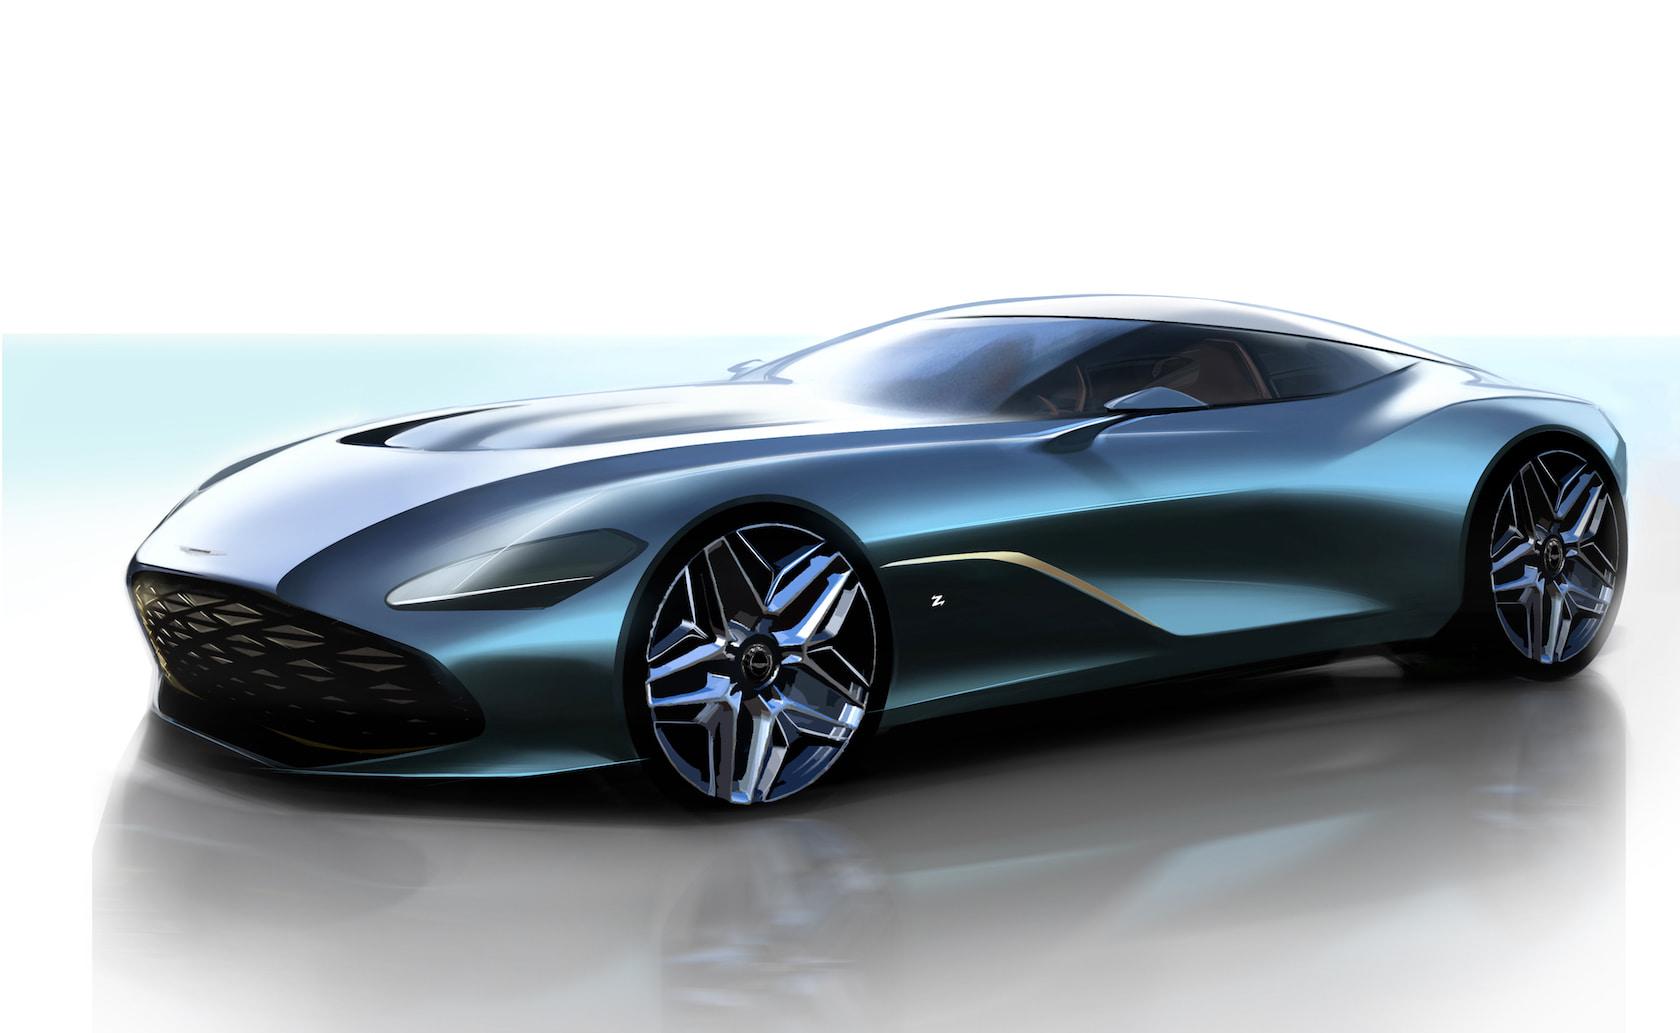 Aston Martin Dbs Gt Zagato Is The Very Best Sort Of Compromise Slashgear